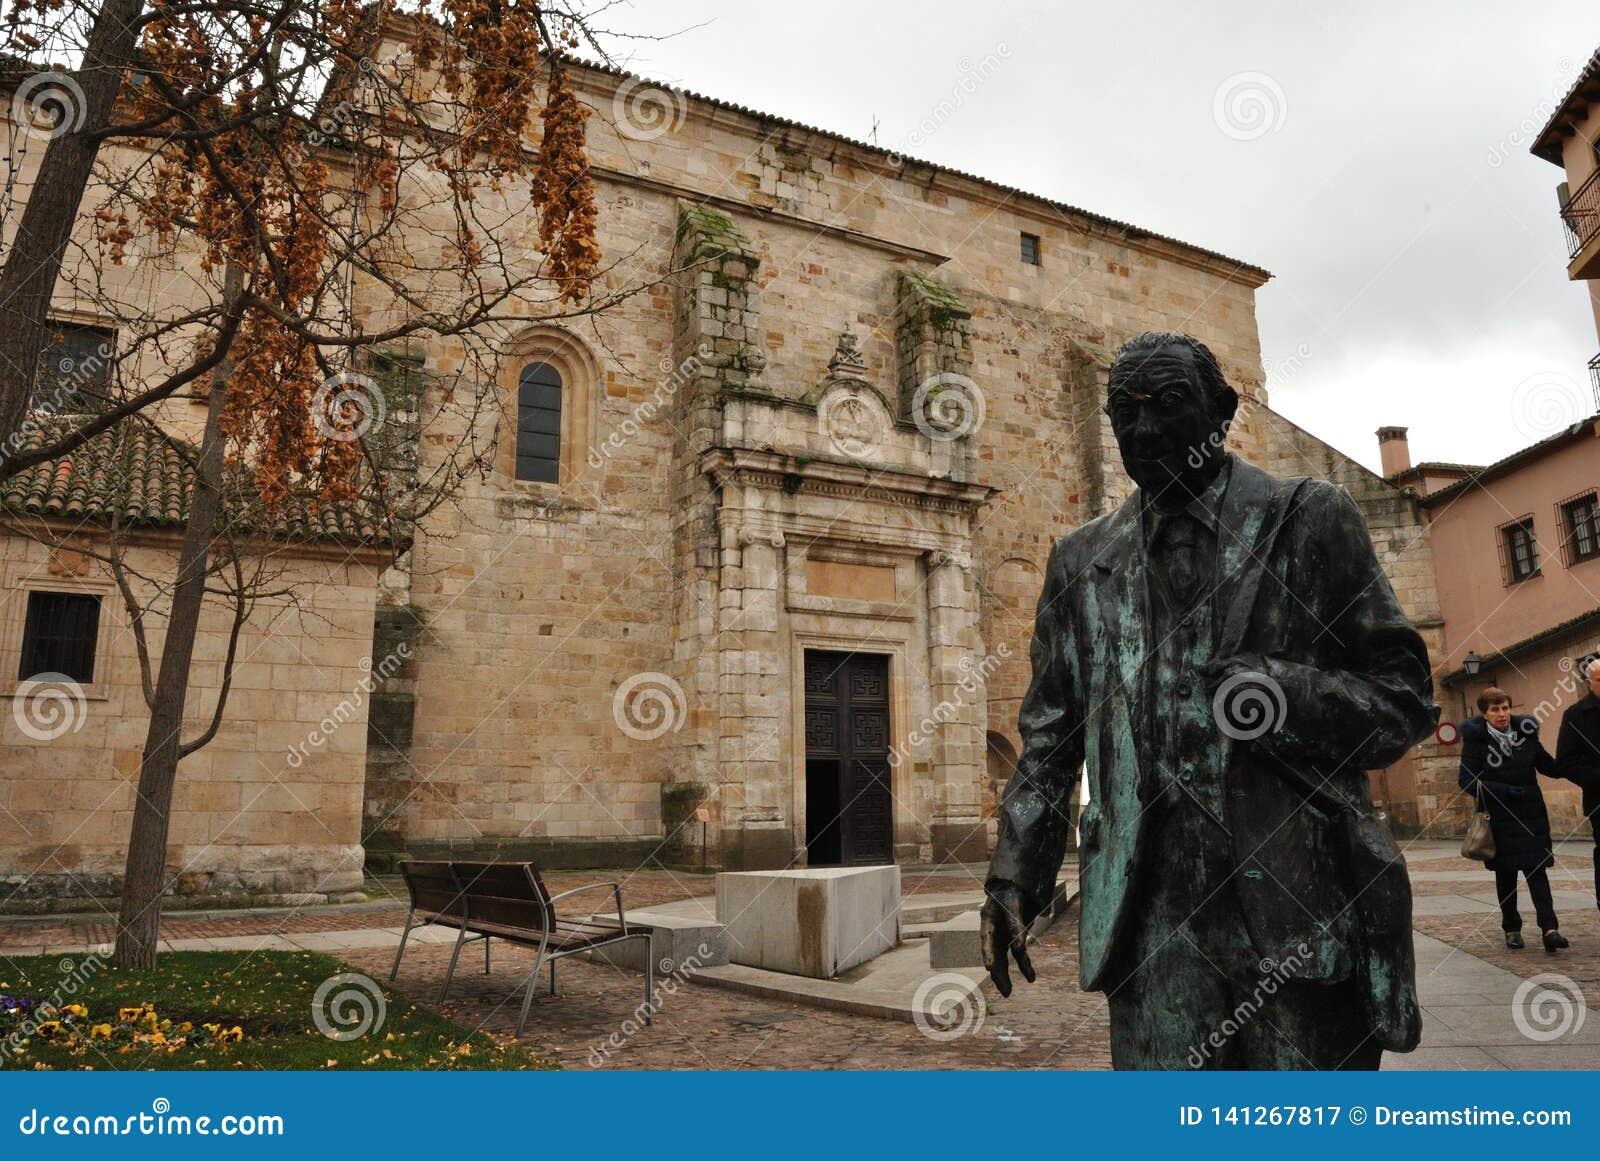 Estatue och San Ildefonso kyrka, Zamora, Spanien